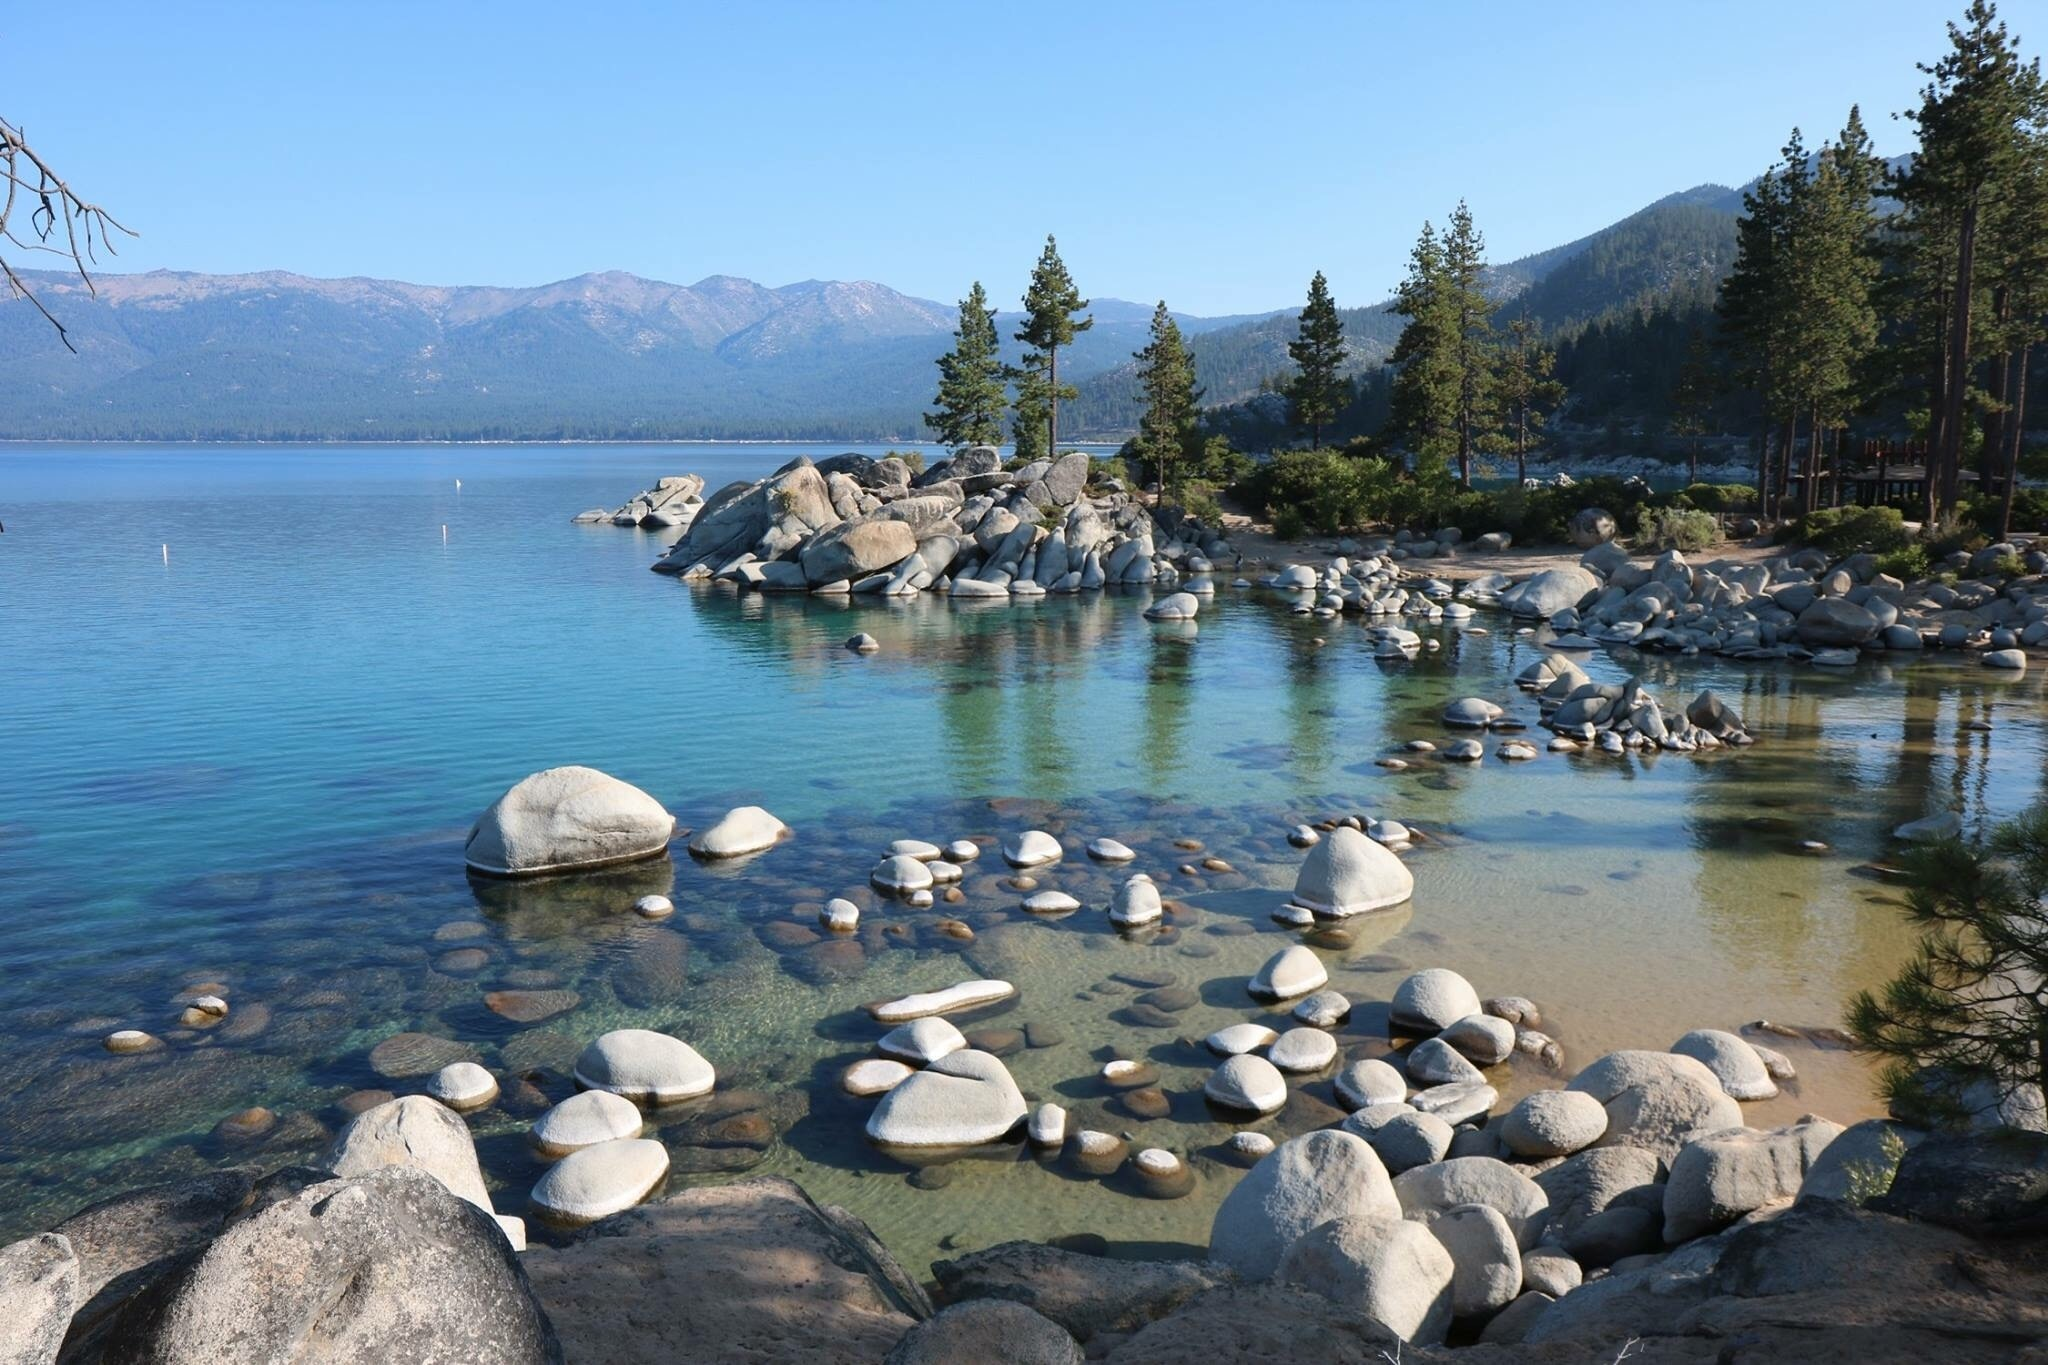 Al Tahoe, South Lake Tahoe, California, United States of America